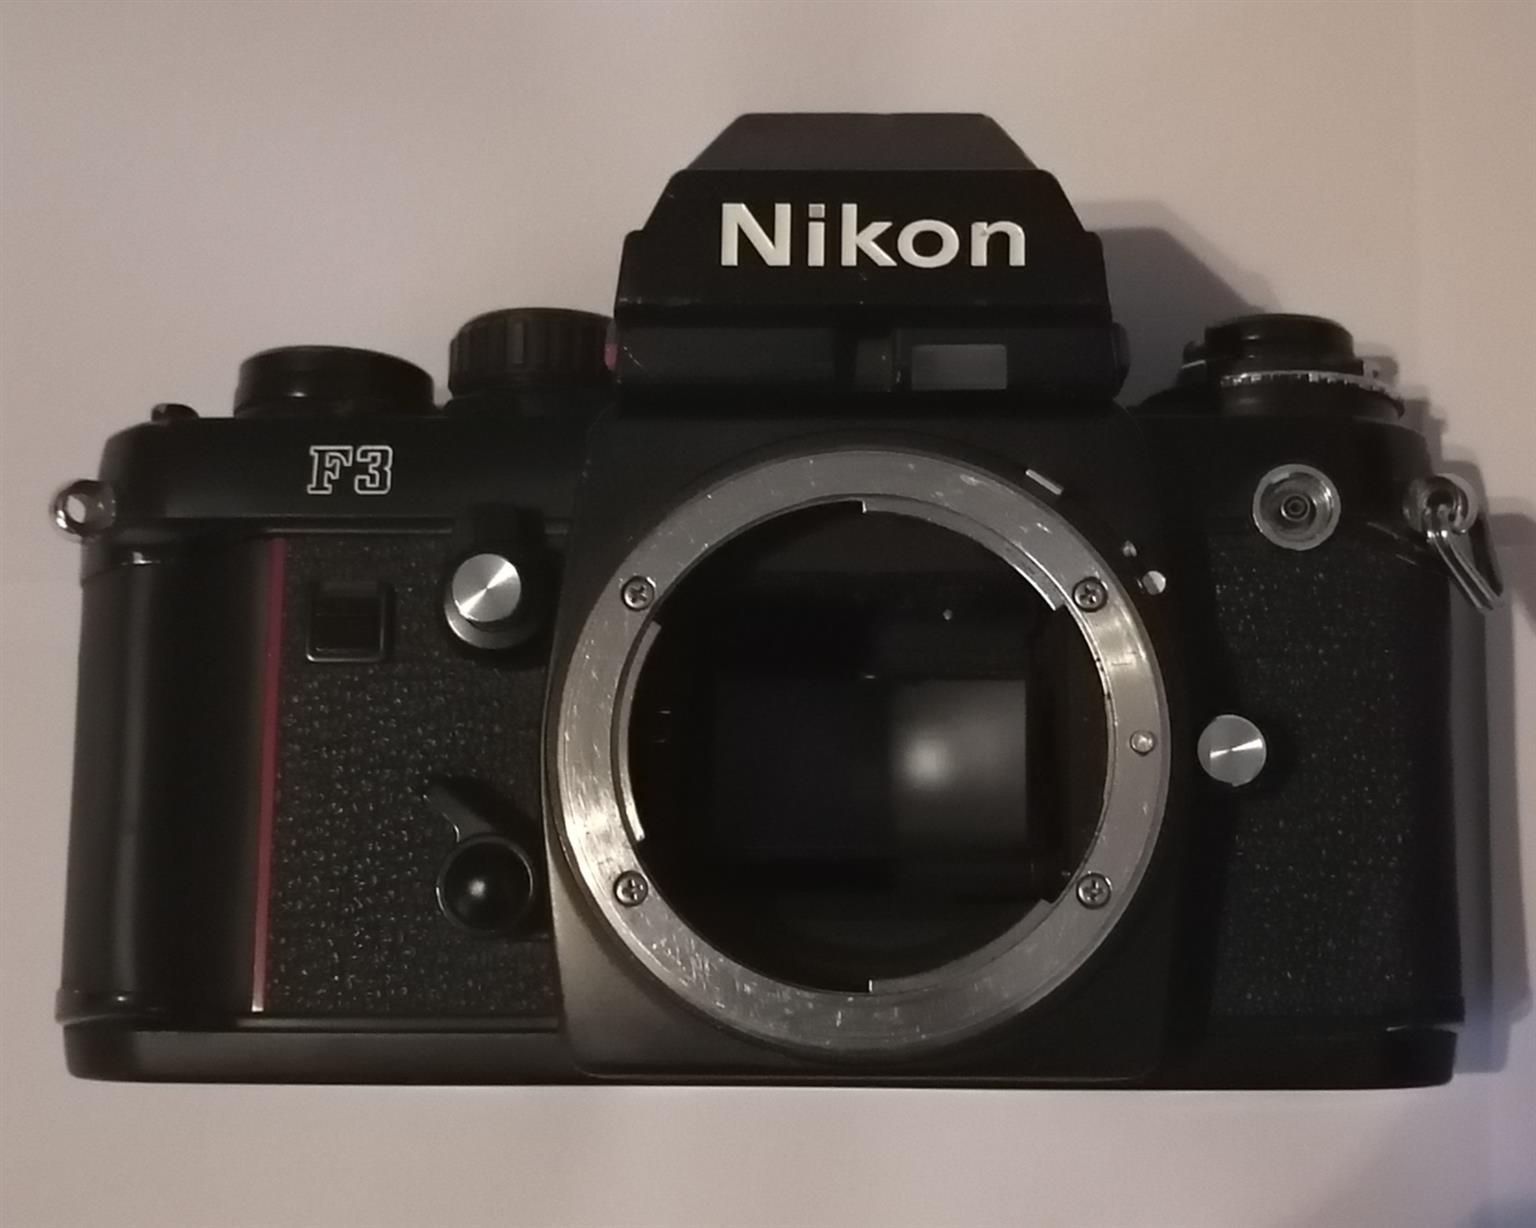 Nikon F3 Black SLR vintage 35mm film camera body only